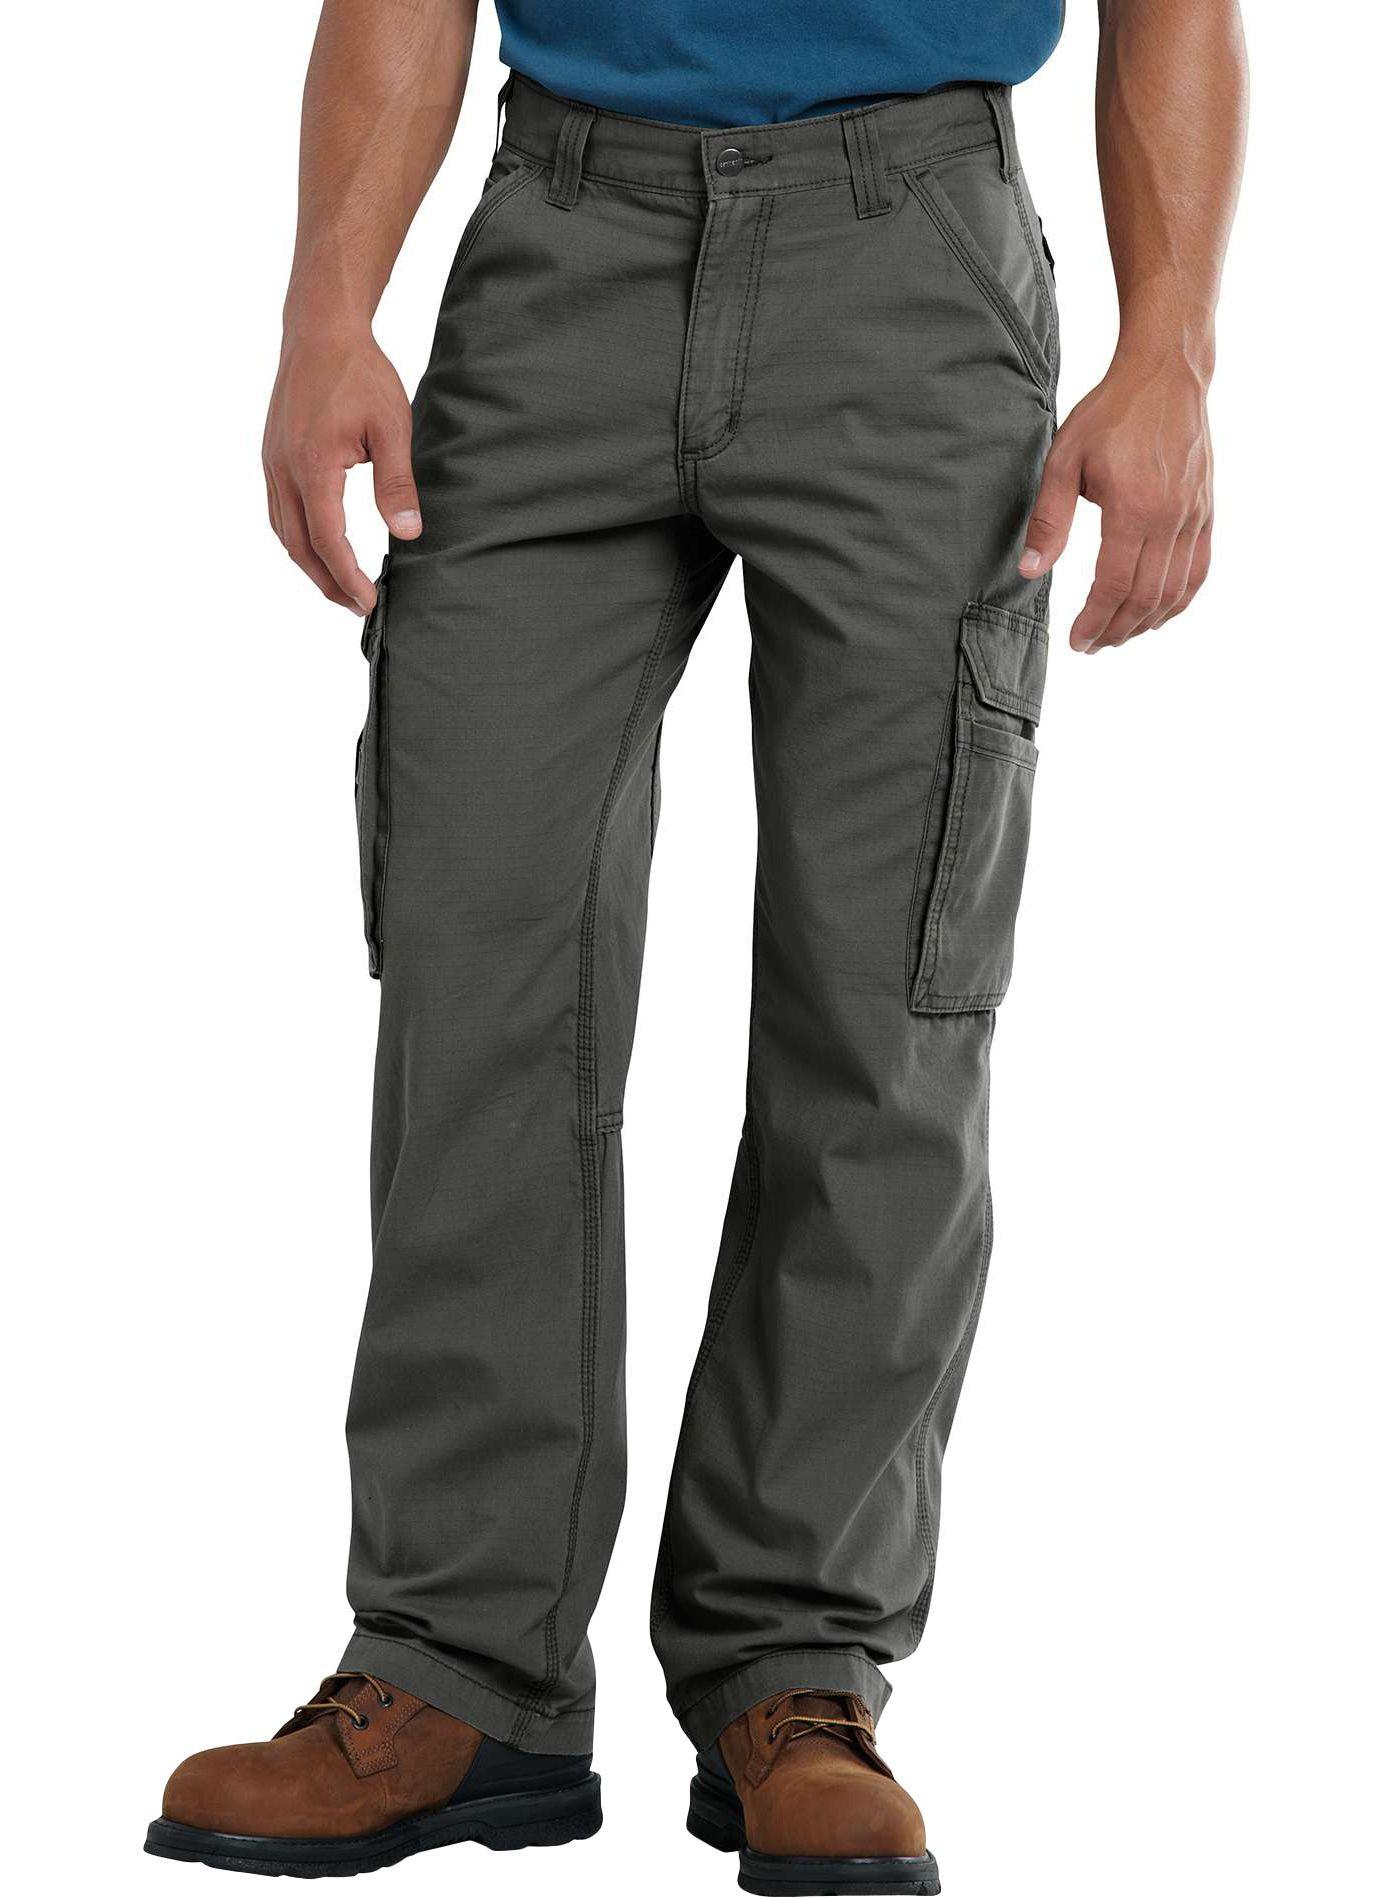 Carhartt Men's Force Tappen Cargo Pants (Regular and Big & Tall)